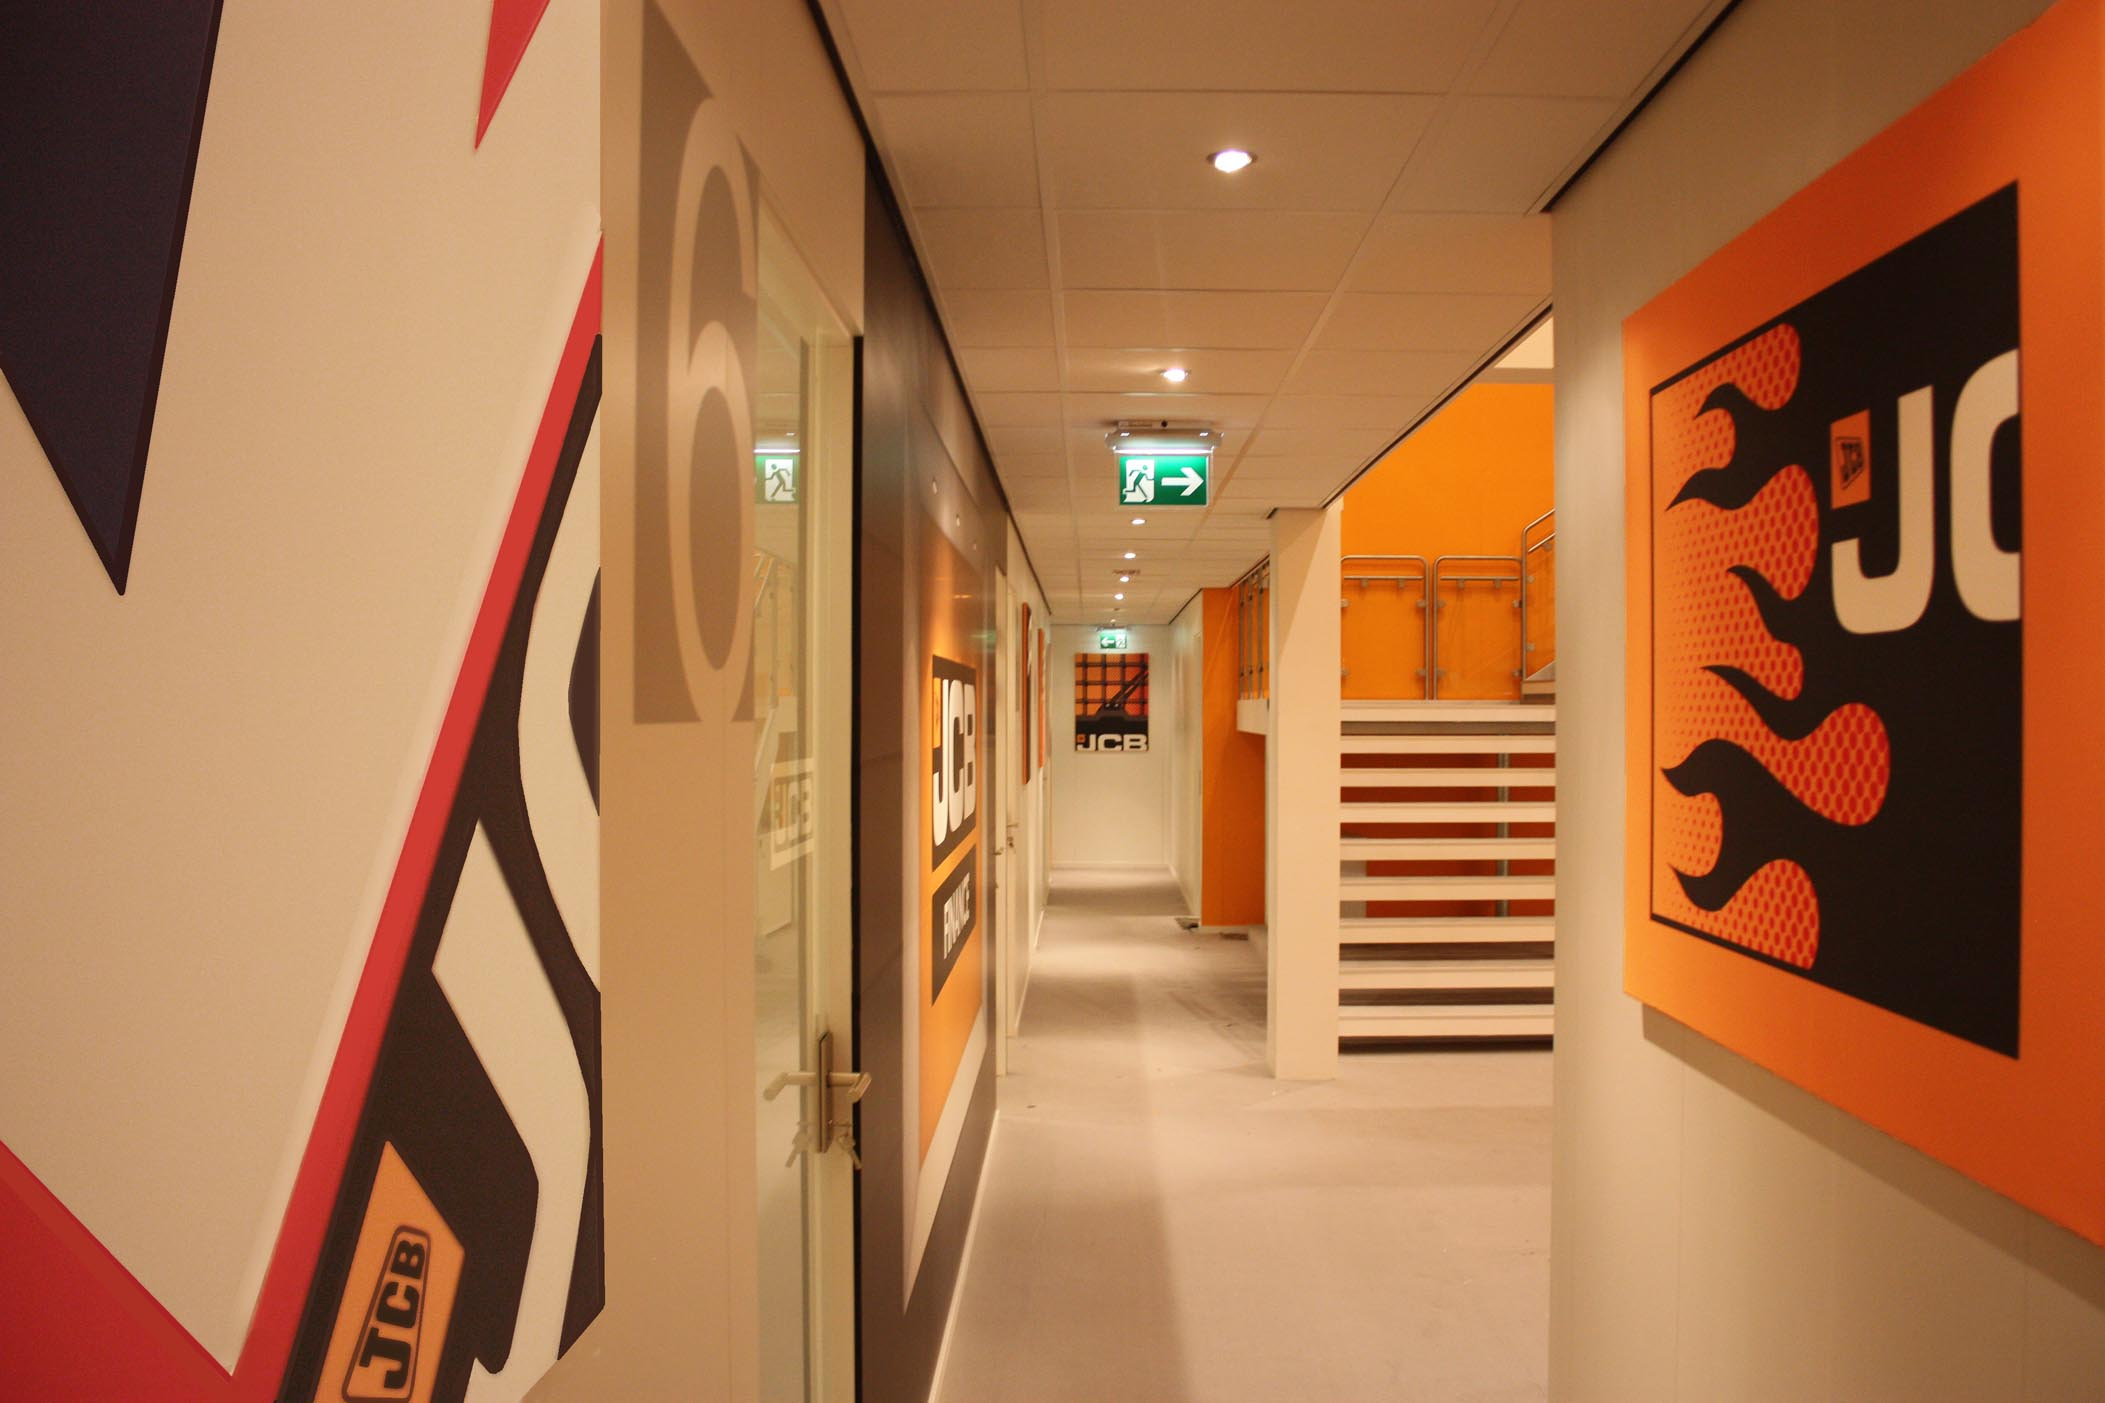 JCB Bauma Office corridor 3